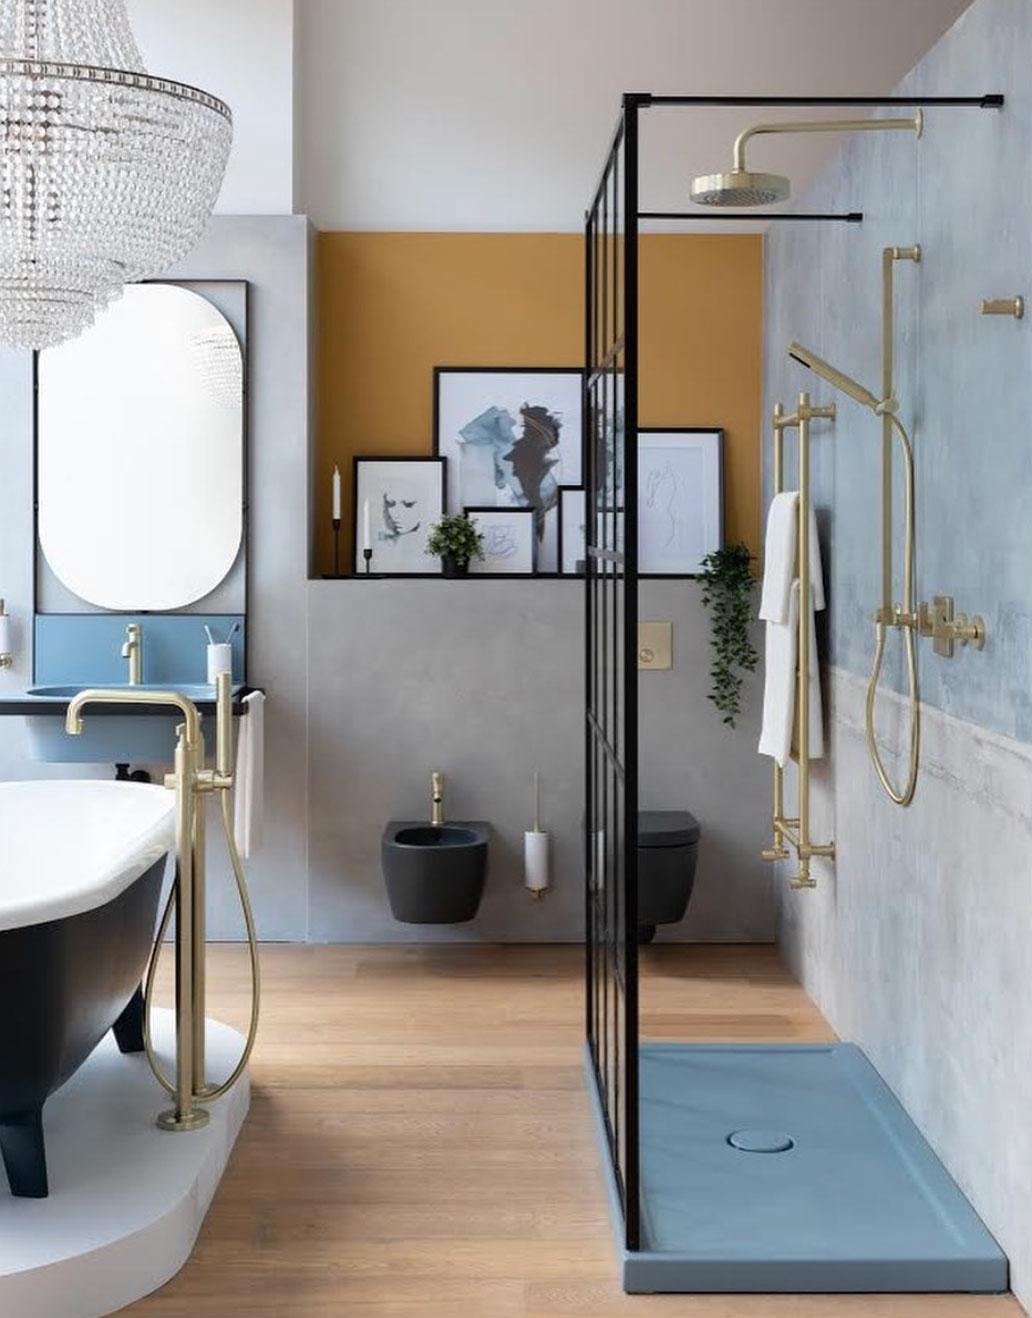 Bathroom Art Ideas Create A Brighter, Artwork For Bathrooms